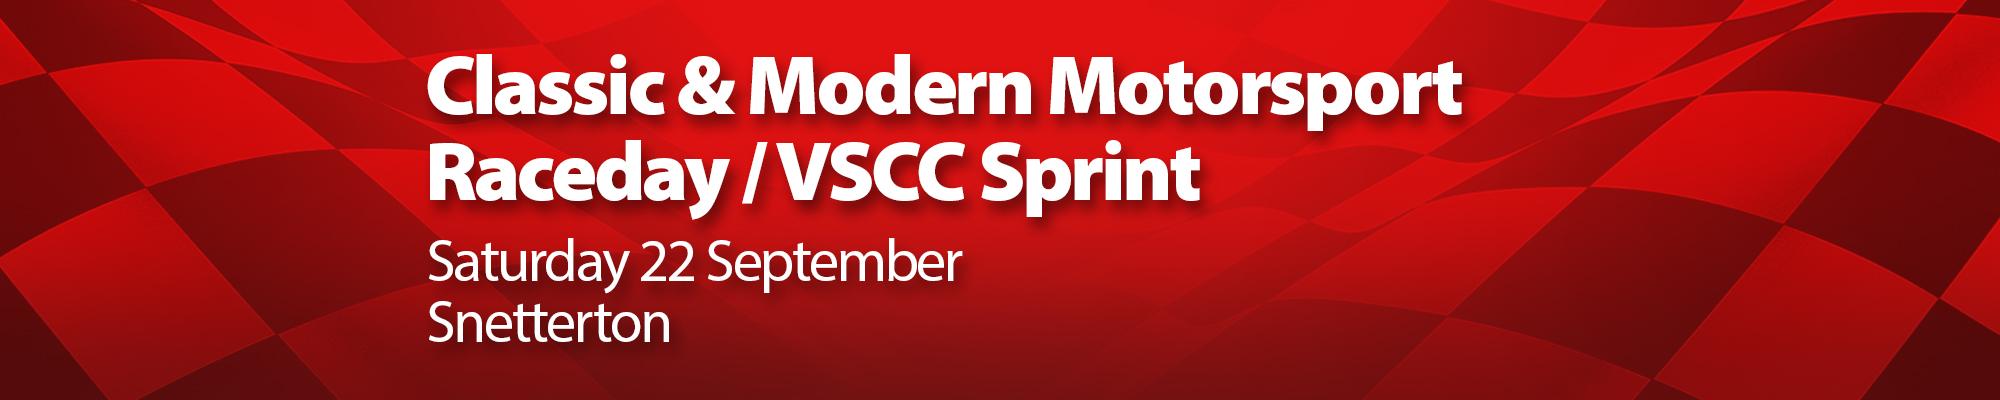 Classic & Modern Motorsport Races/VSCC Sprint